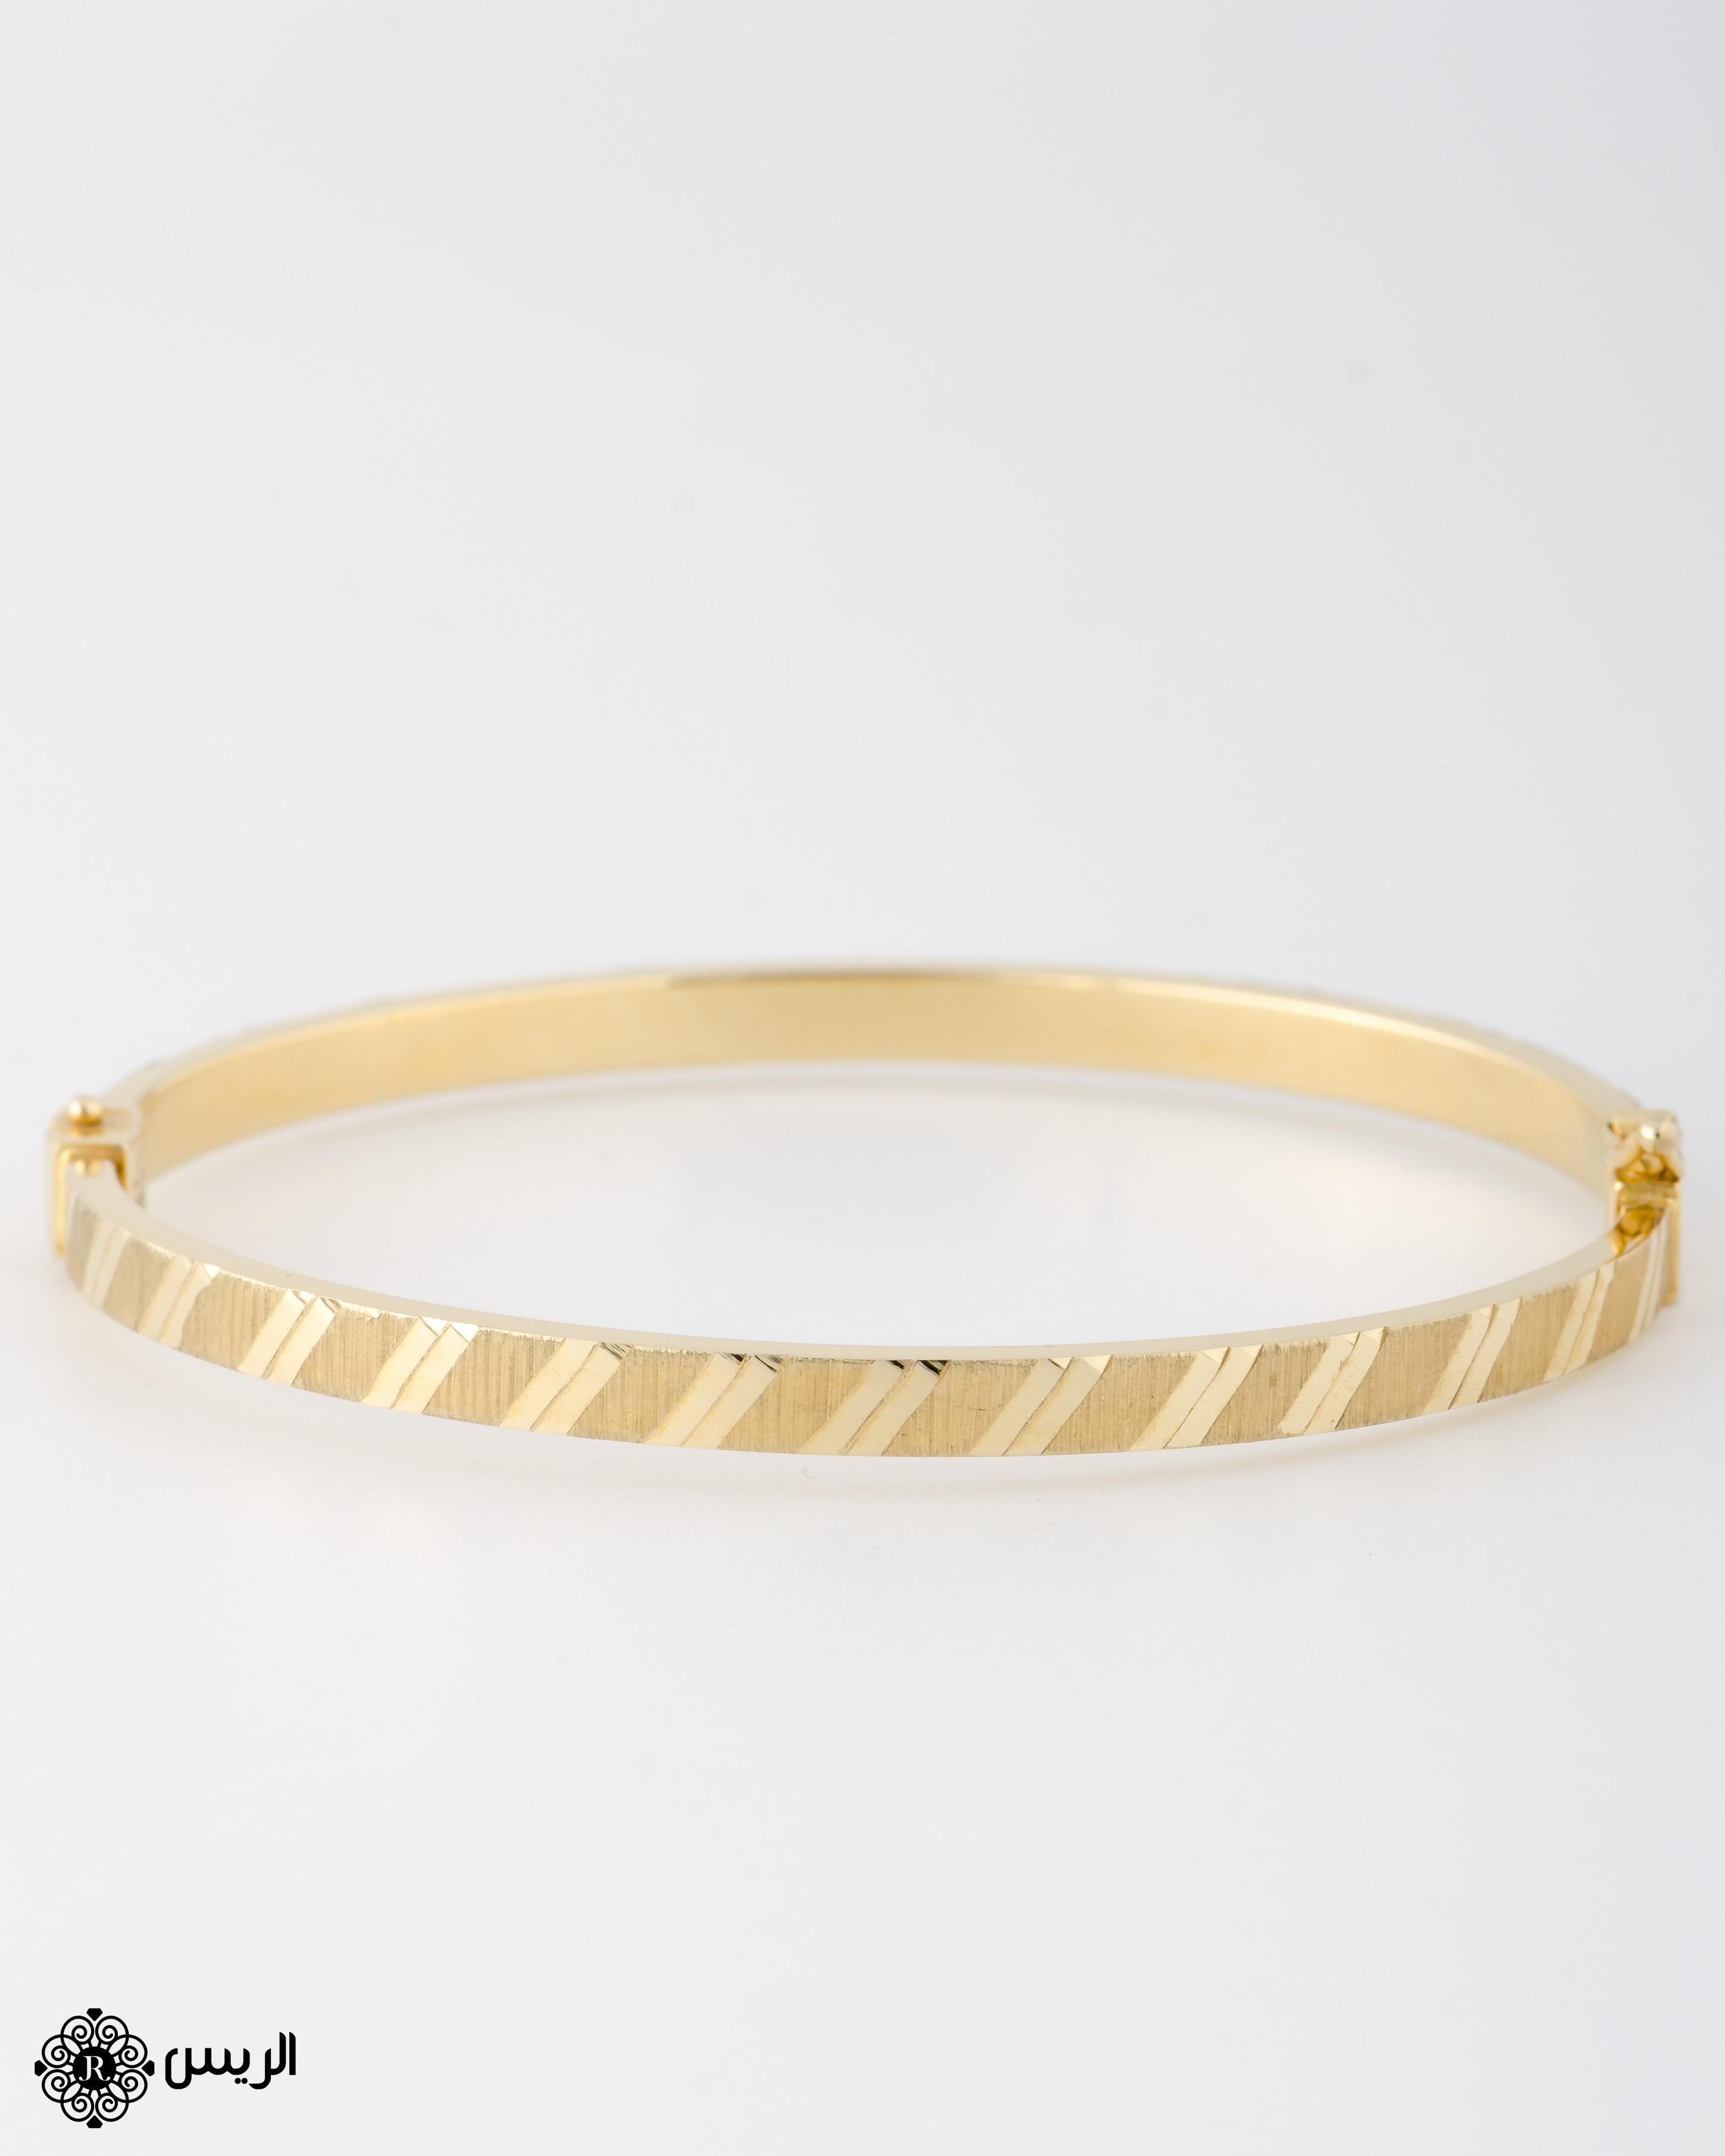 Raies jewelry Bangle Italian Design إسورة تصميم إيطالي الريس للمجوهرات